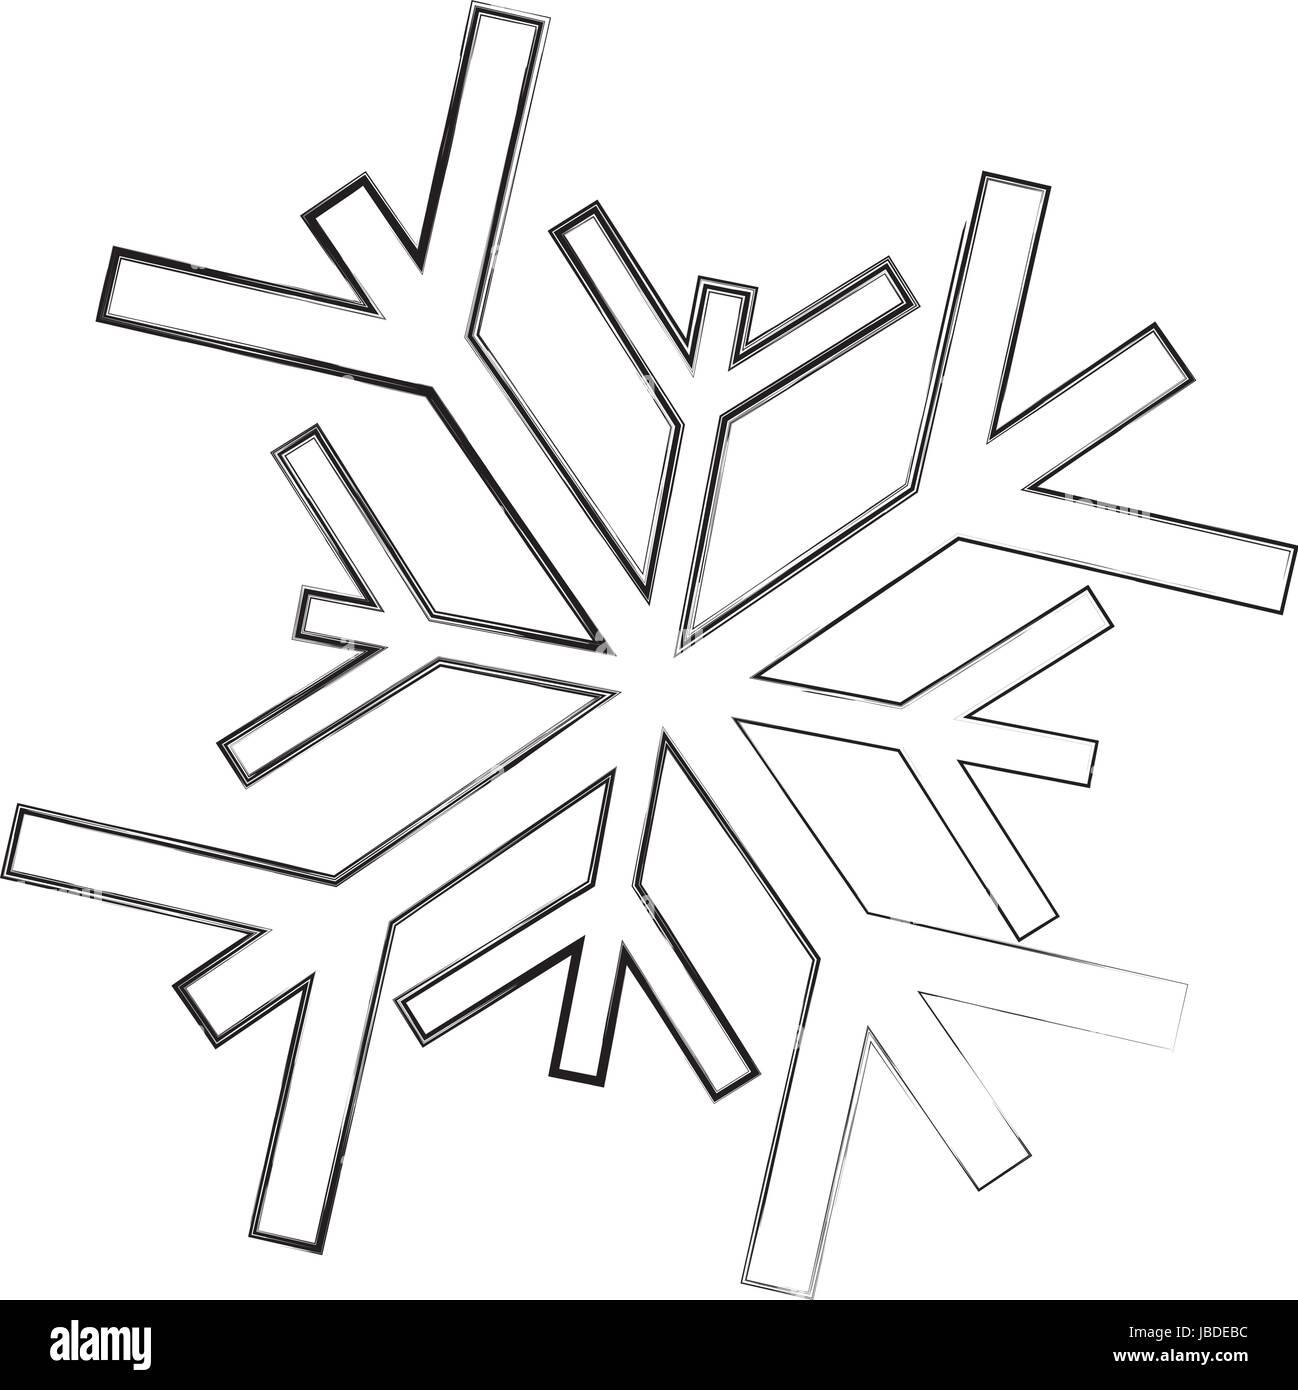 Skizze Zu Zeichnen Schneeflocke Cartoon Stock Vektorgrafik Alamy